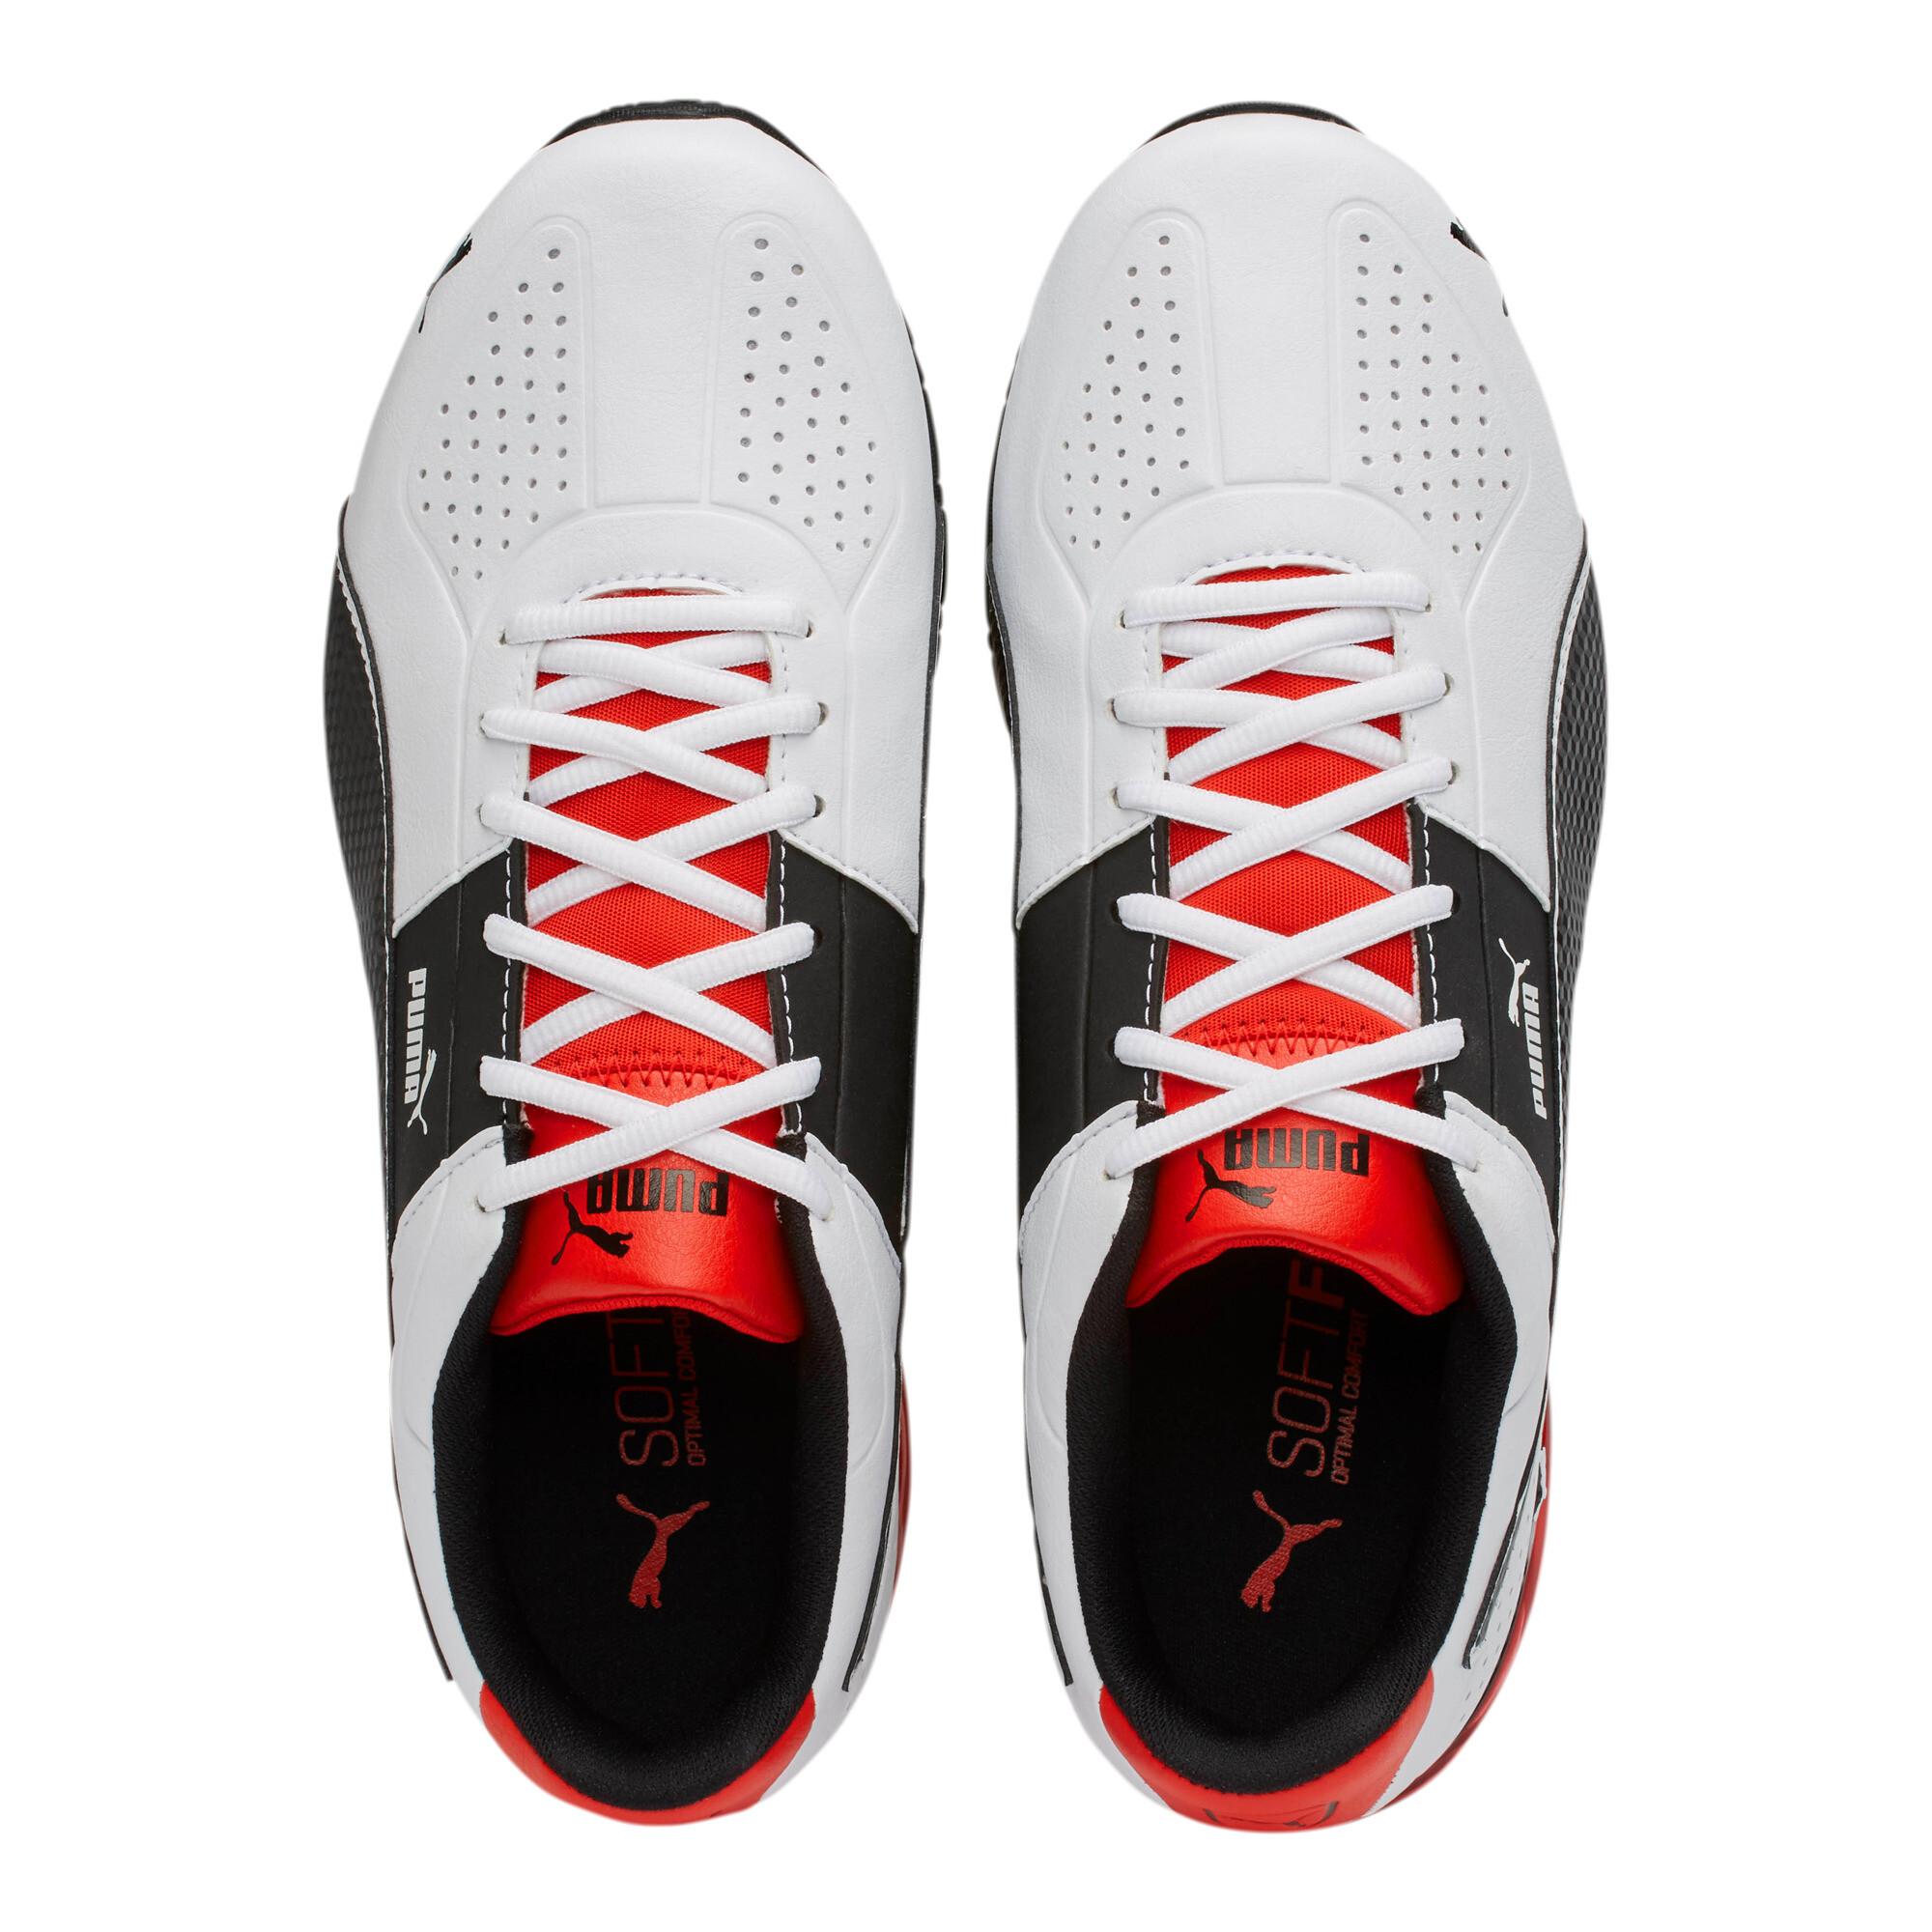 PUMA-Cell-Surin-2-Wide-Men-s-Training-Shoes-Men-Shoe-Running thumbnail 7